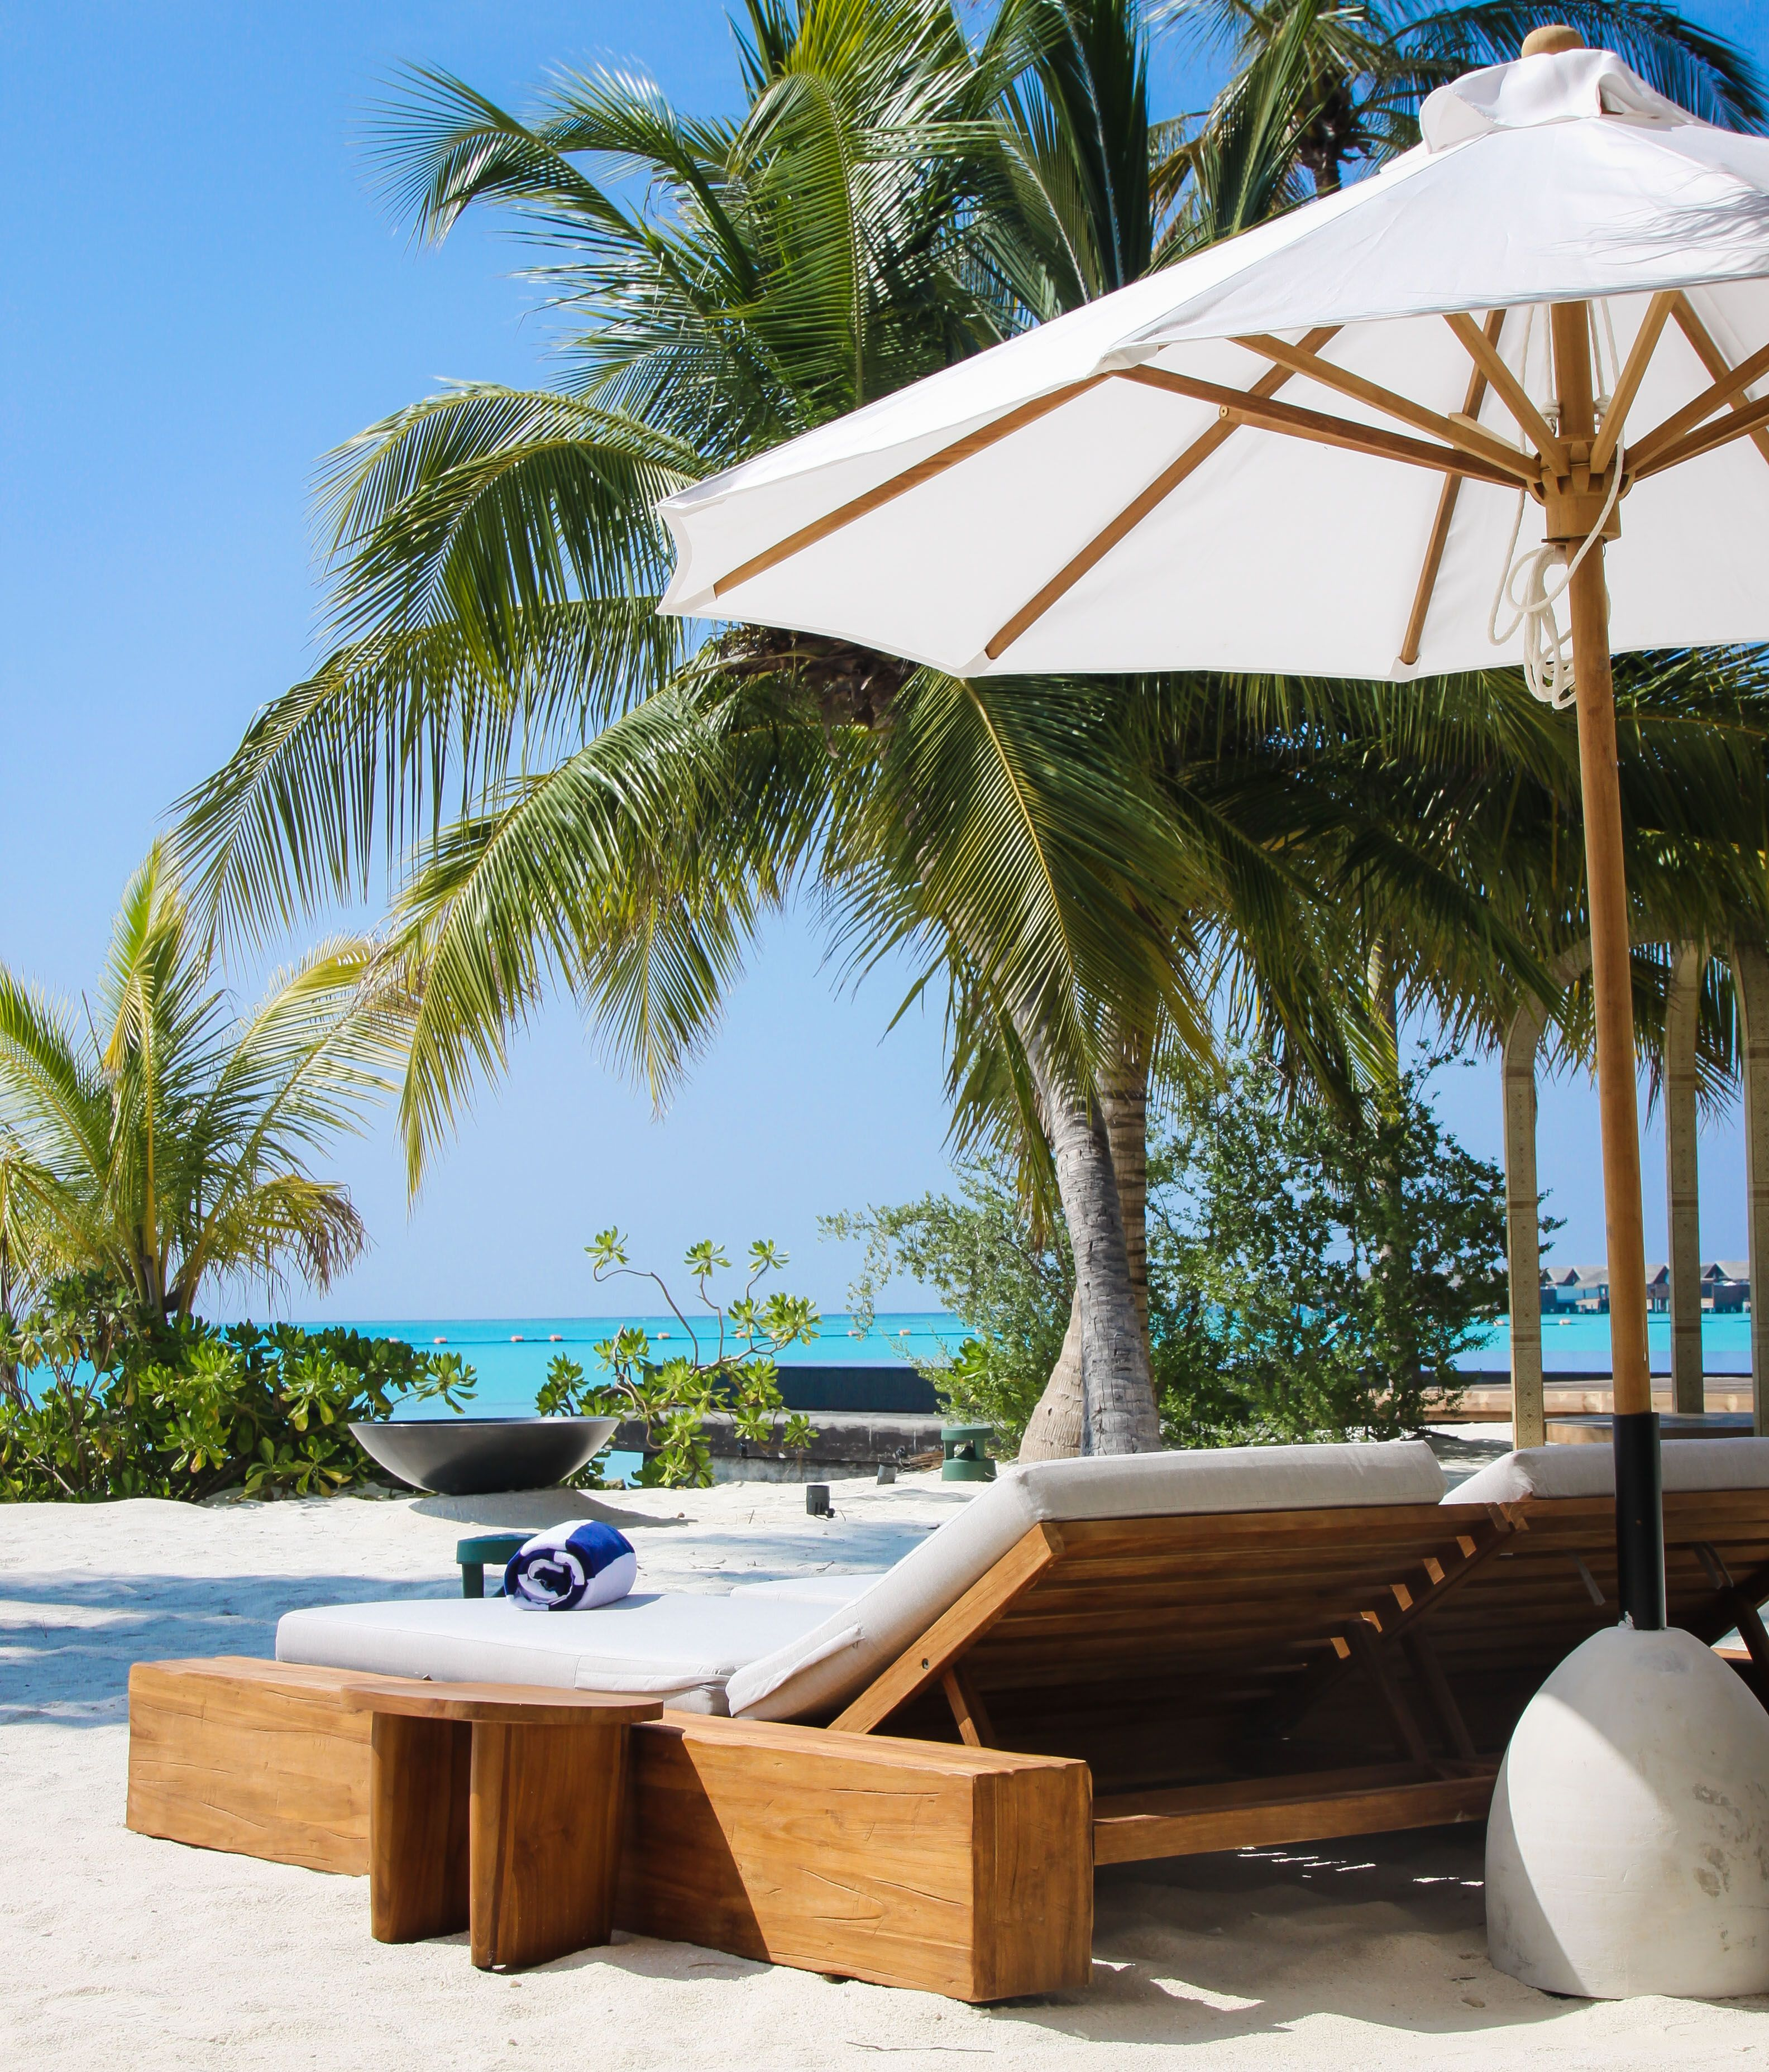 Discover Fairmont Maldives Sirru Fen Fushi And The World's